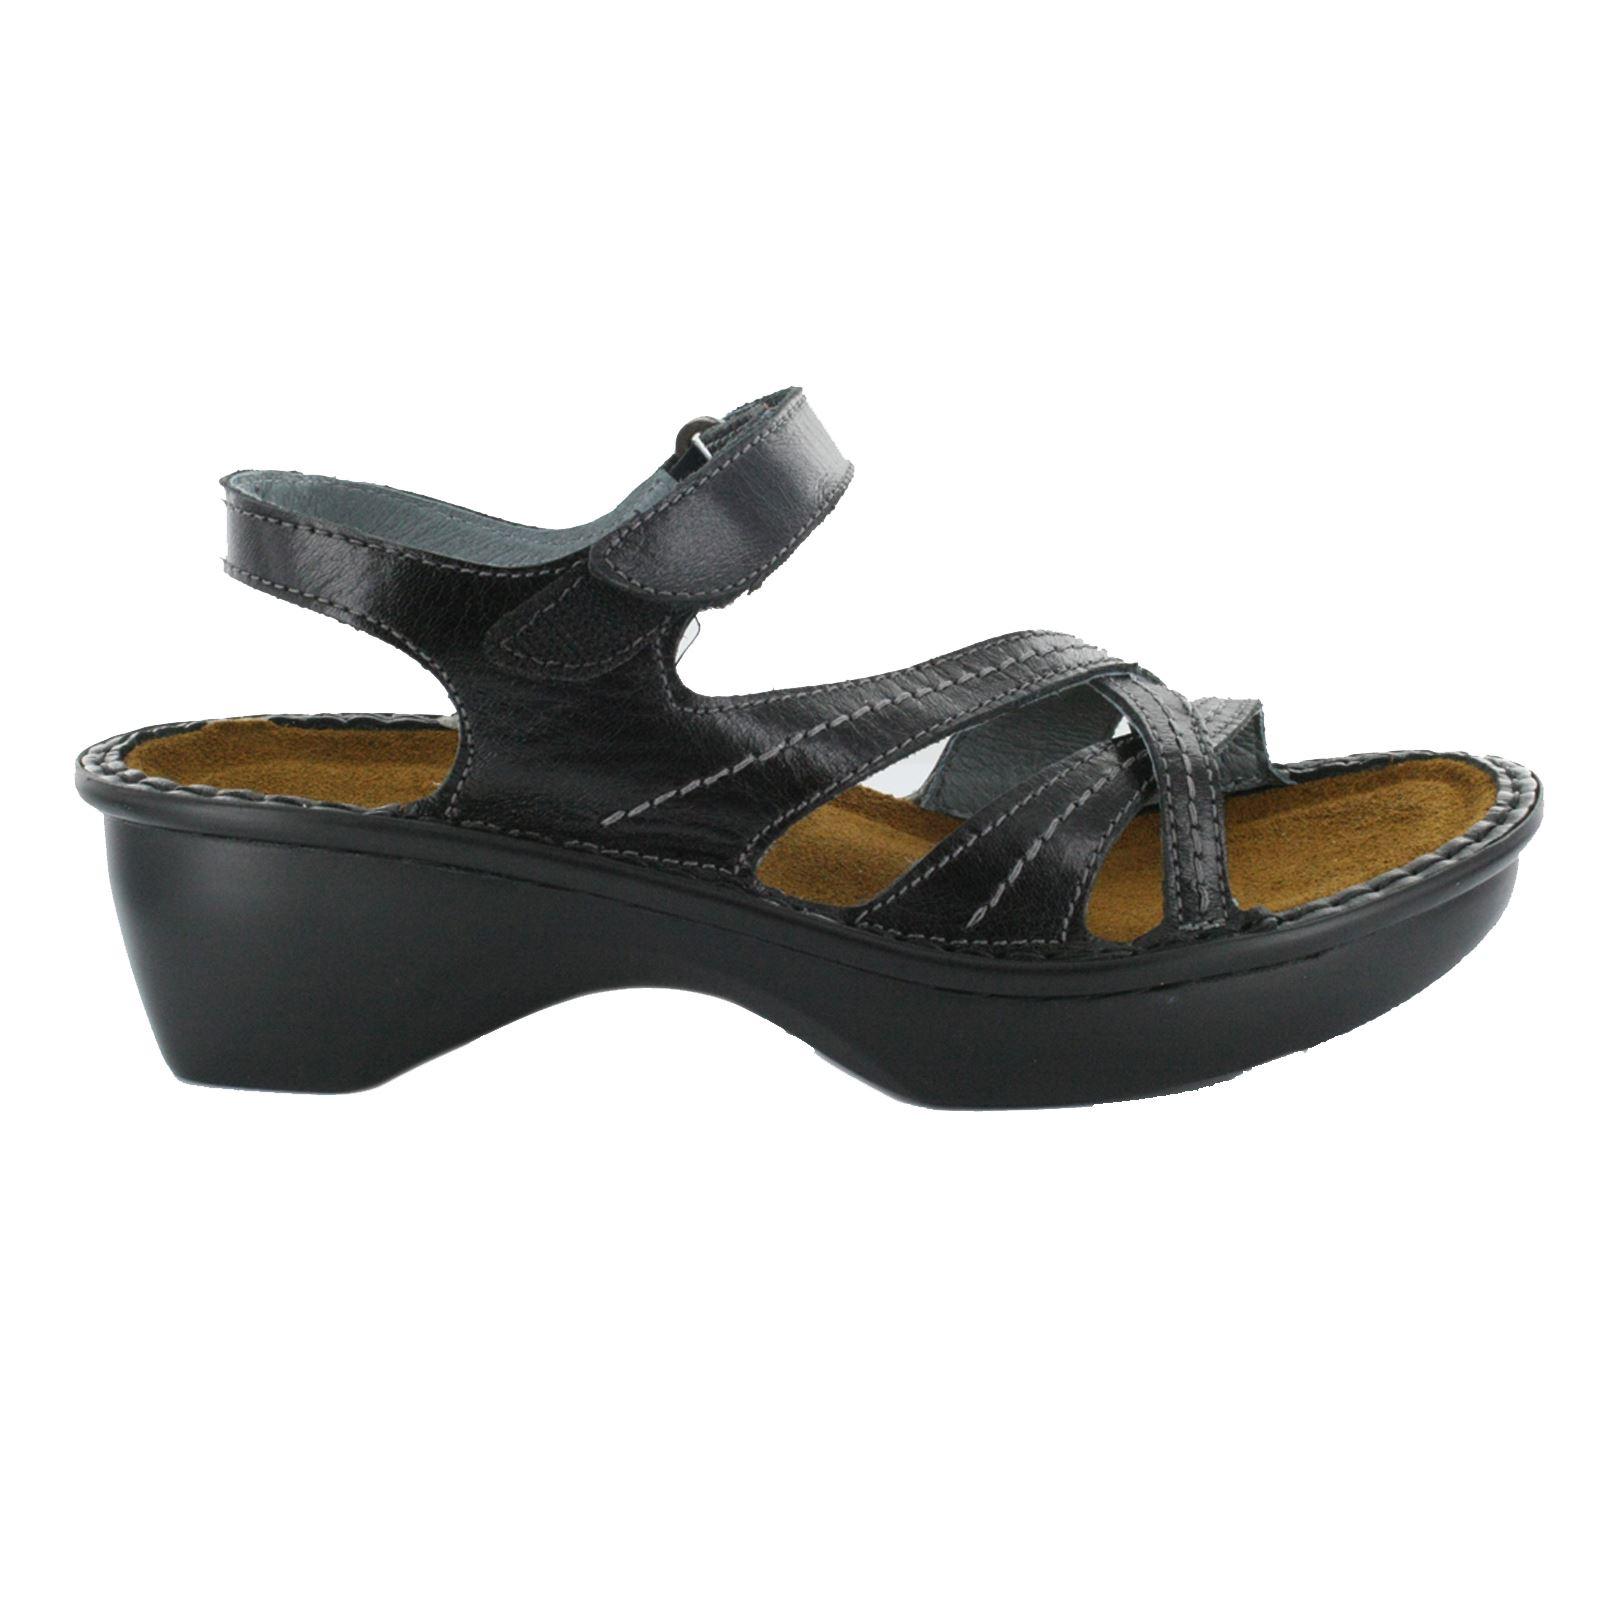 Naot Shoes Black Velcro